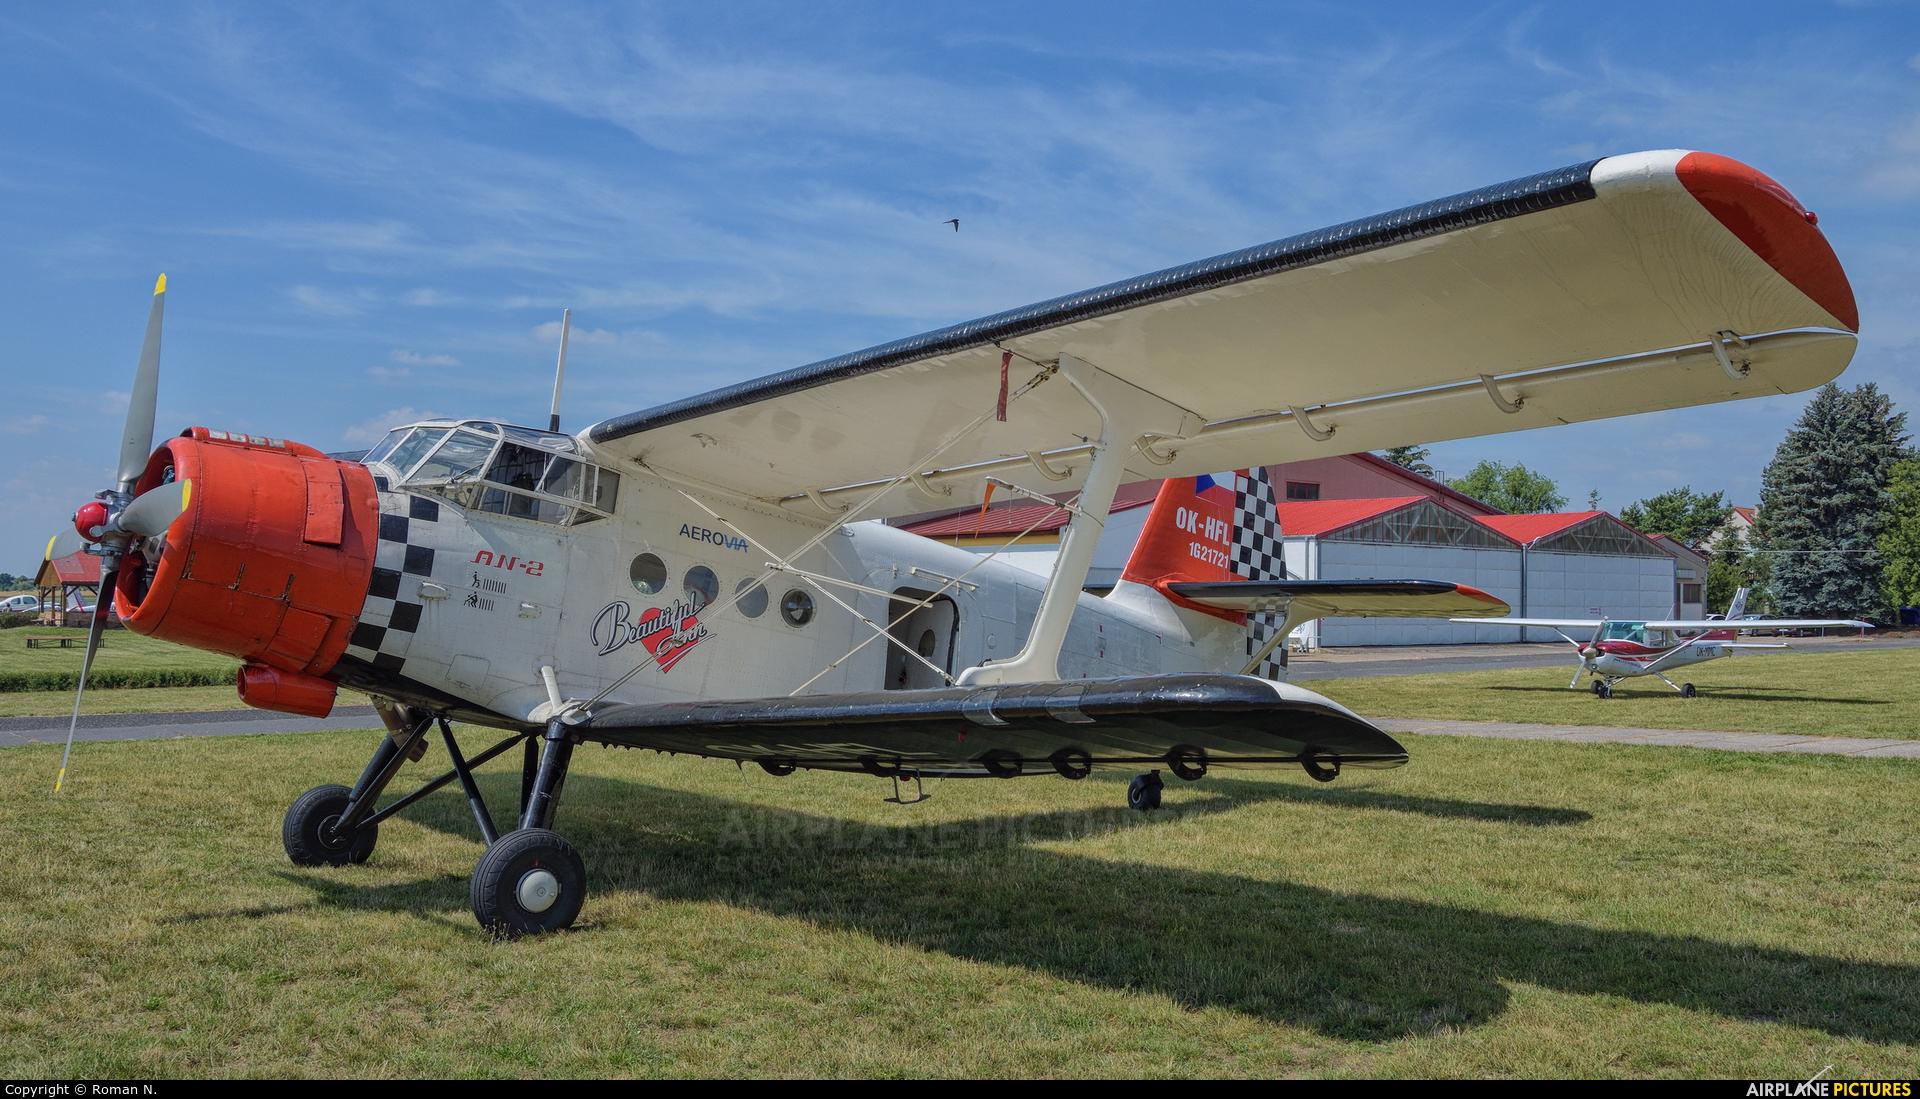 Heritage of Flying Legends OK-HFL aircraft at Mladá Boleslav